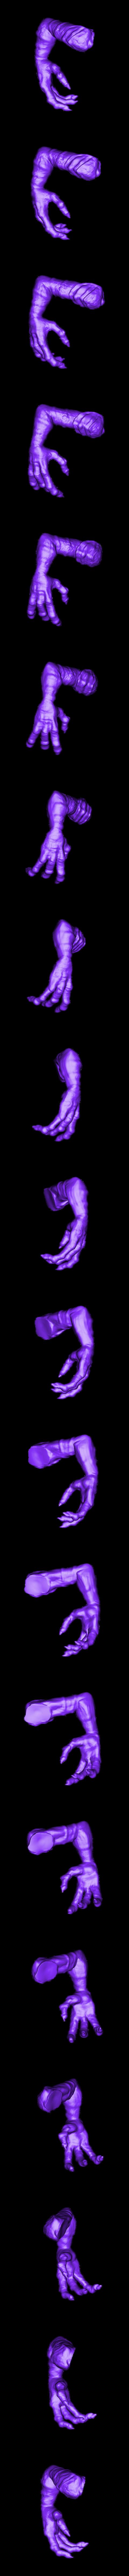 Stripe_right_arm.stl Download free STL file Stripe Gremlin • 3D printer model, 3rdesignworks